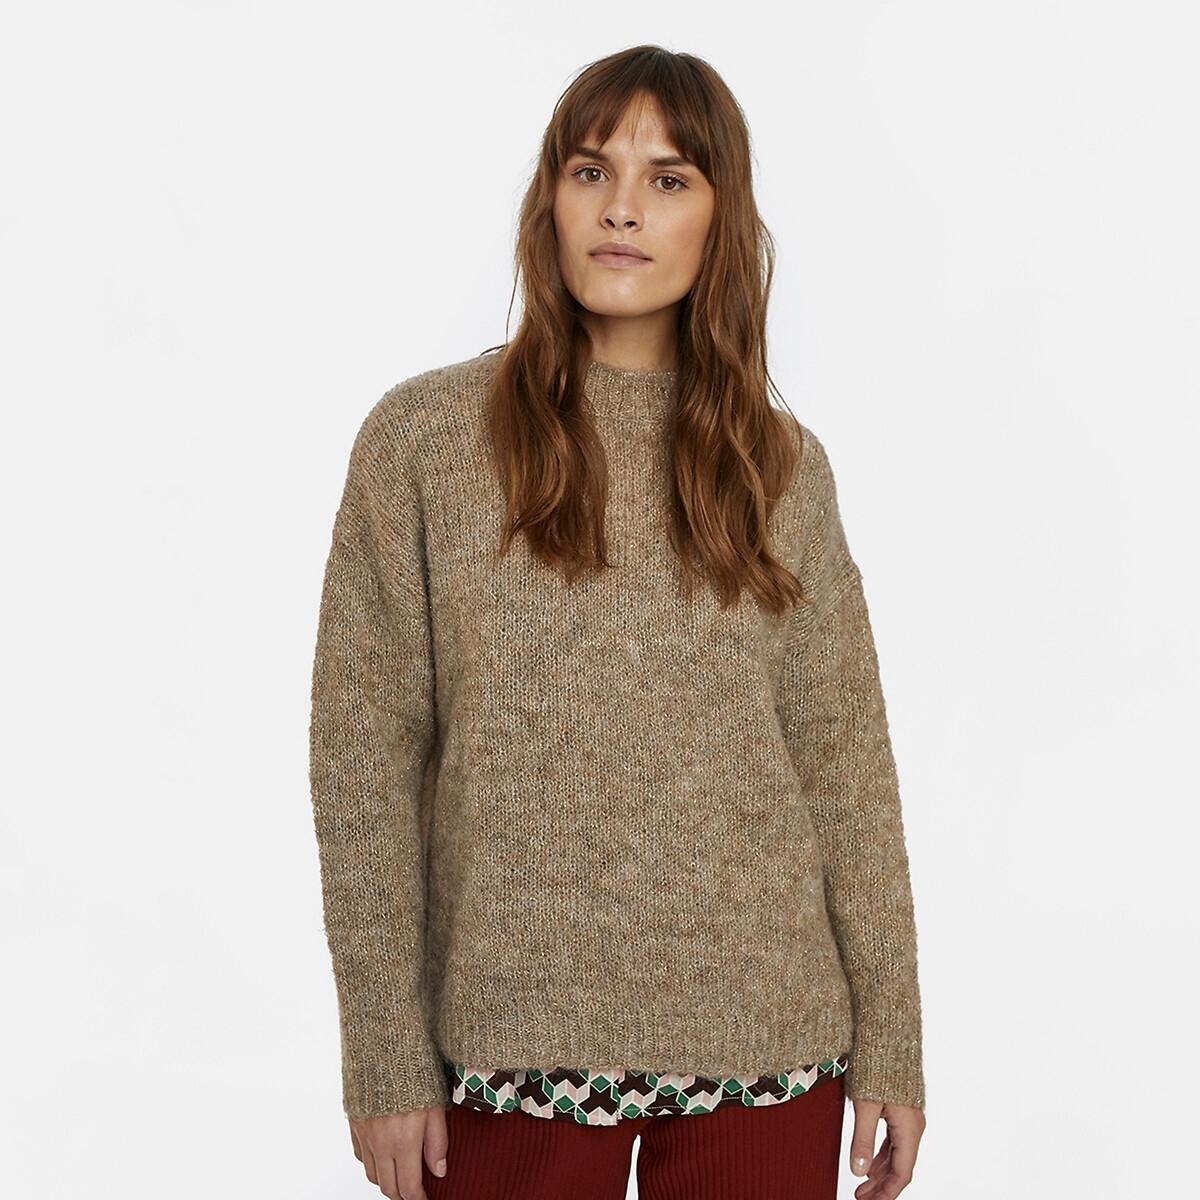 Пуловер LaRedoute Из плотного трикотажа с круглым вырезом S бежевый